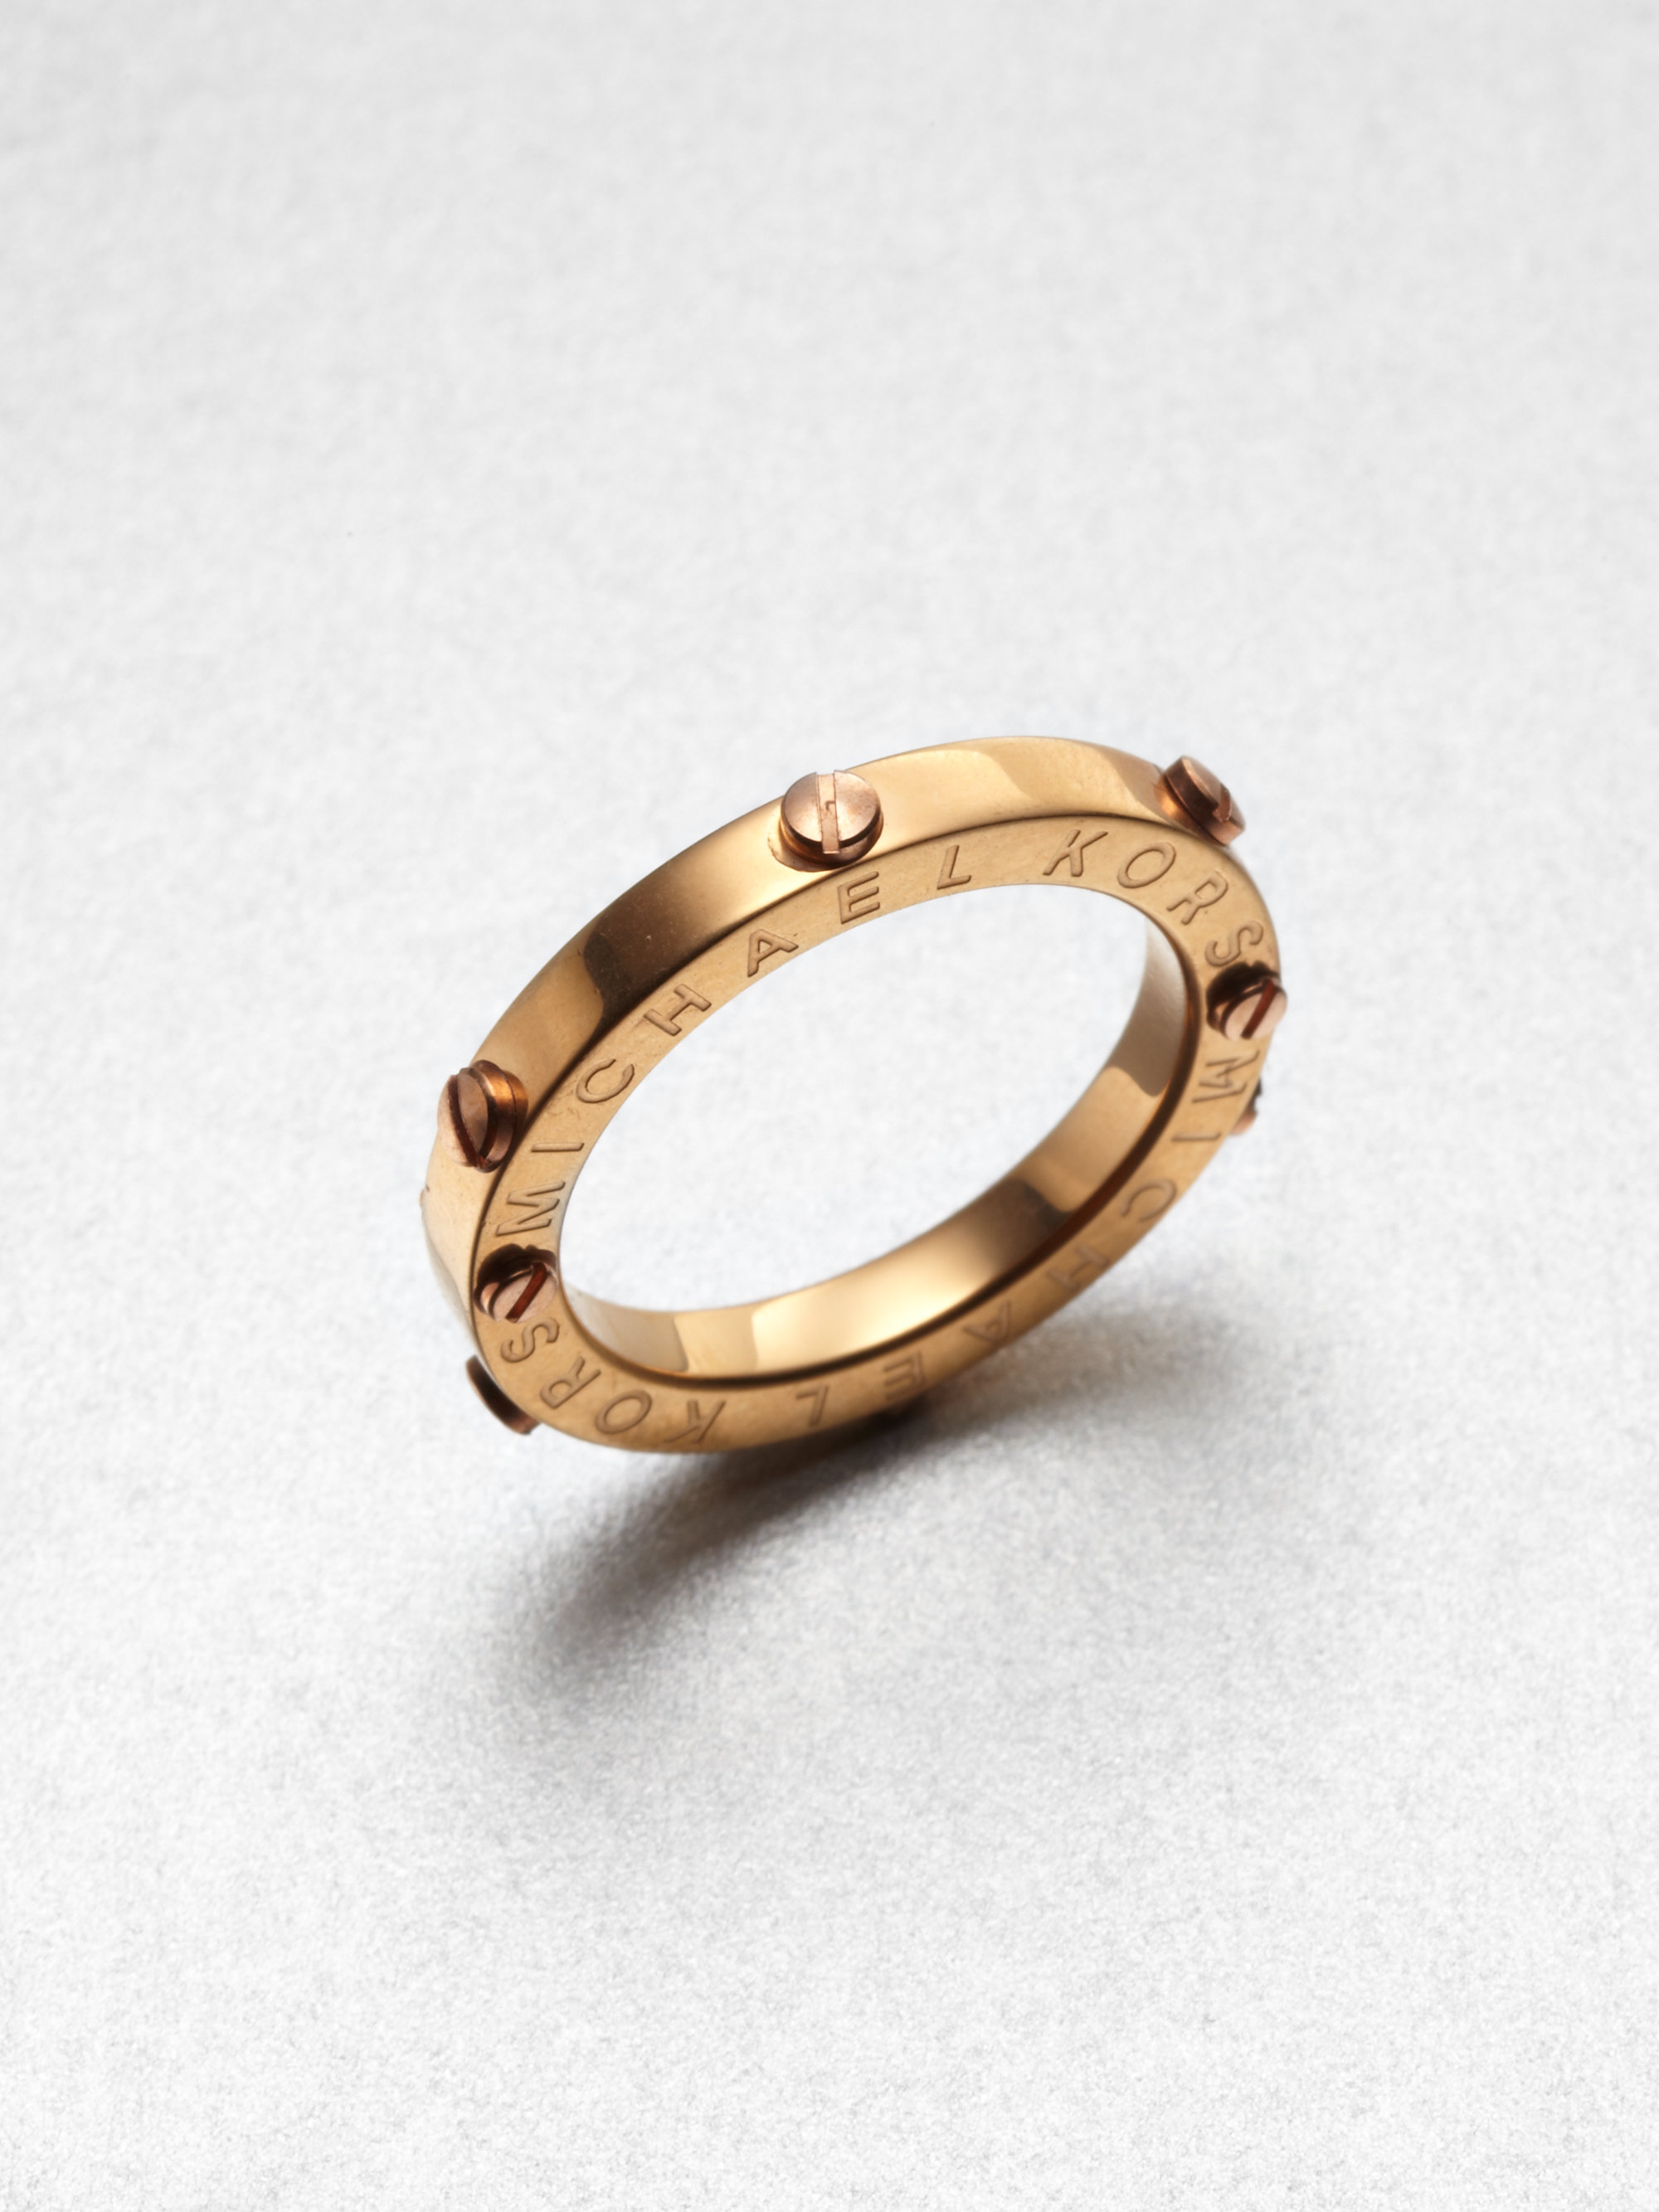 michael kors rivet accented ring rose gold tone in gold rose gold lyst. Black Bedroom Furniture Sets. Home Design Ideas